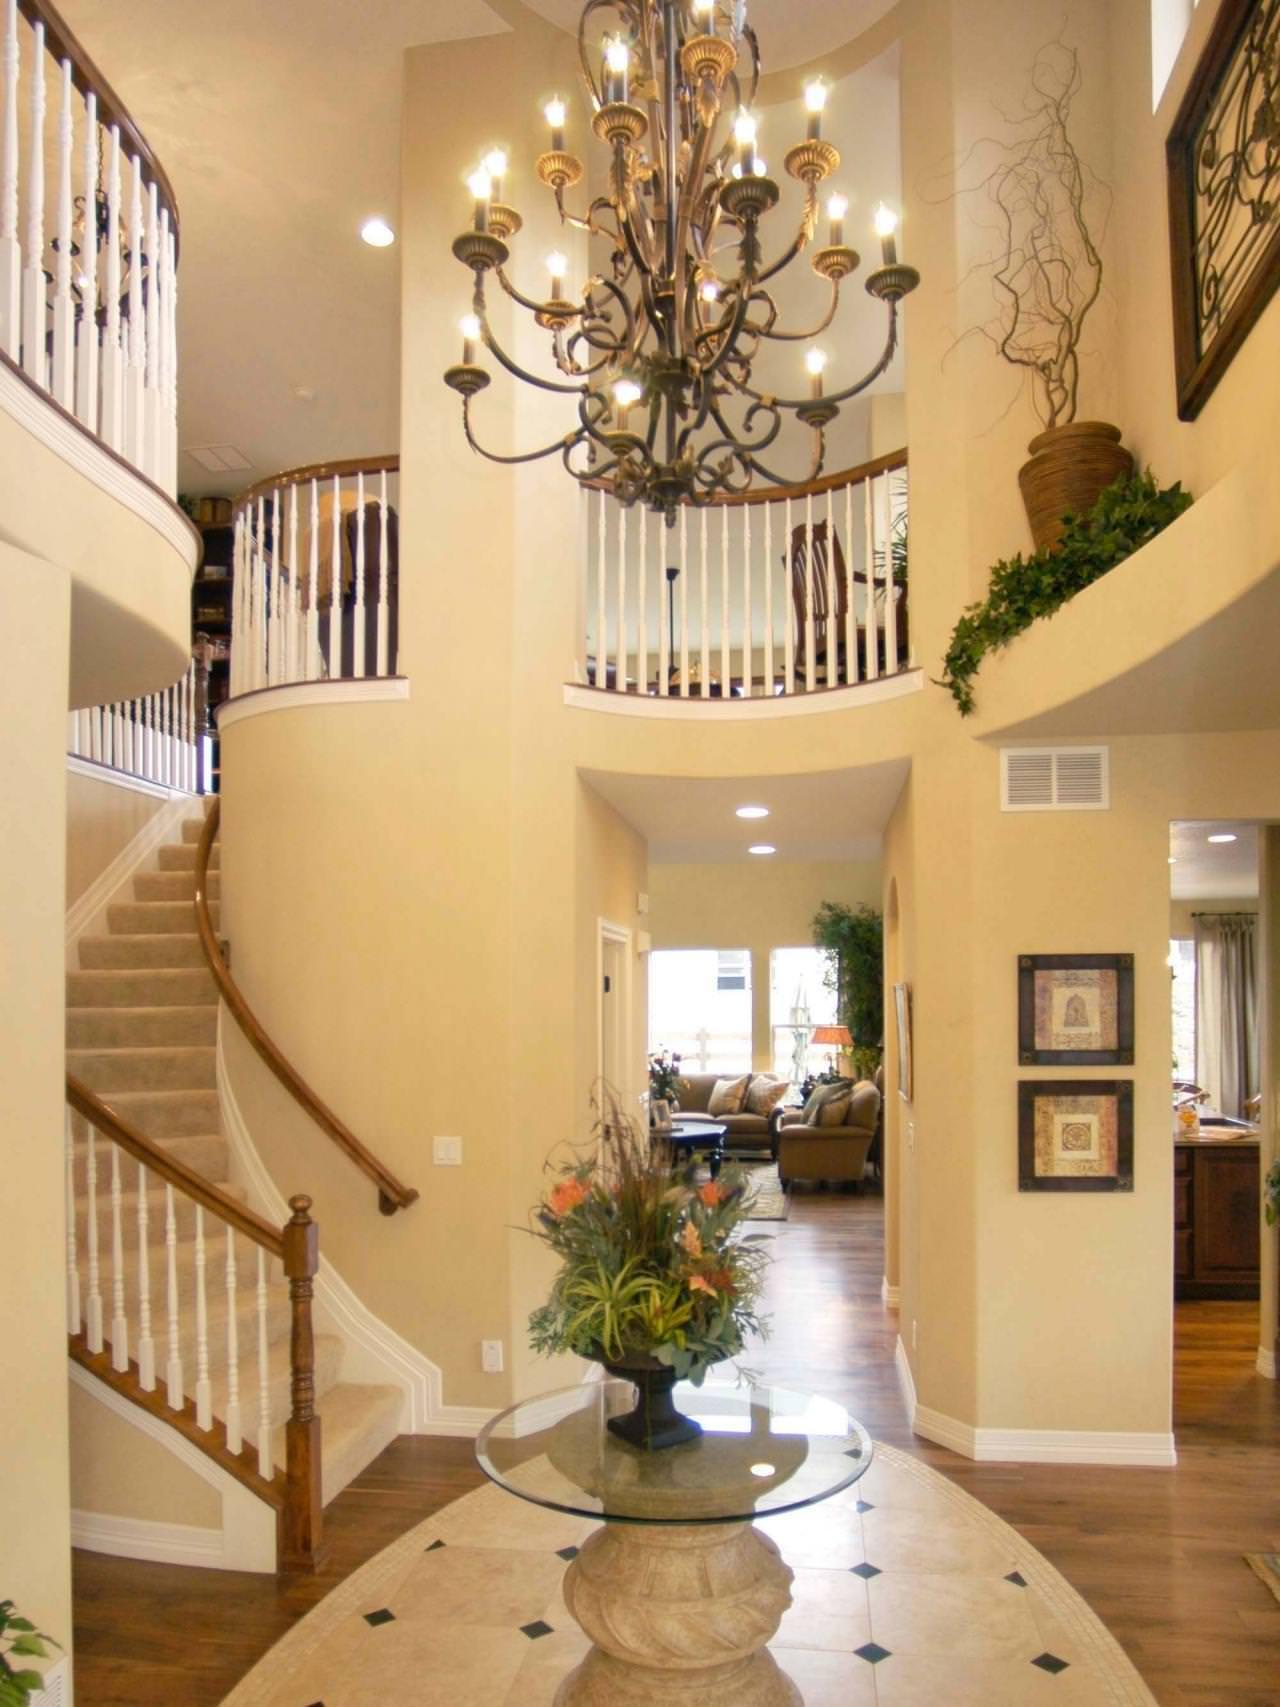 Best Light Fixtures For Hallways Ideas Pertaining To Hallway Chandeliers (View 9 of 25)